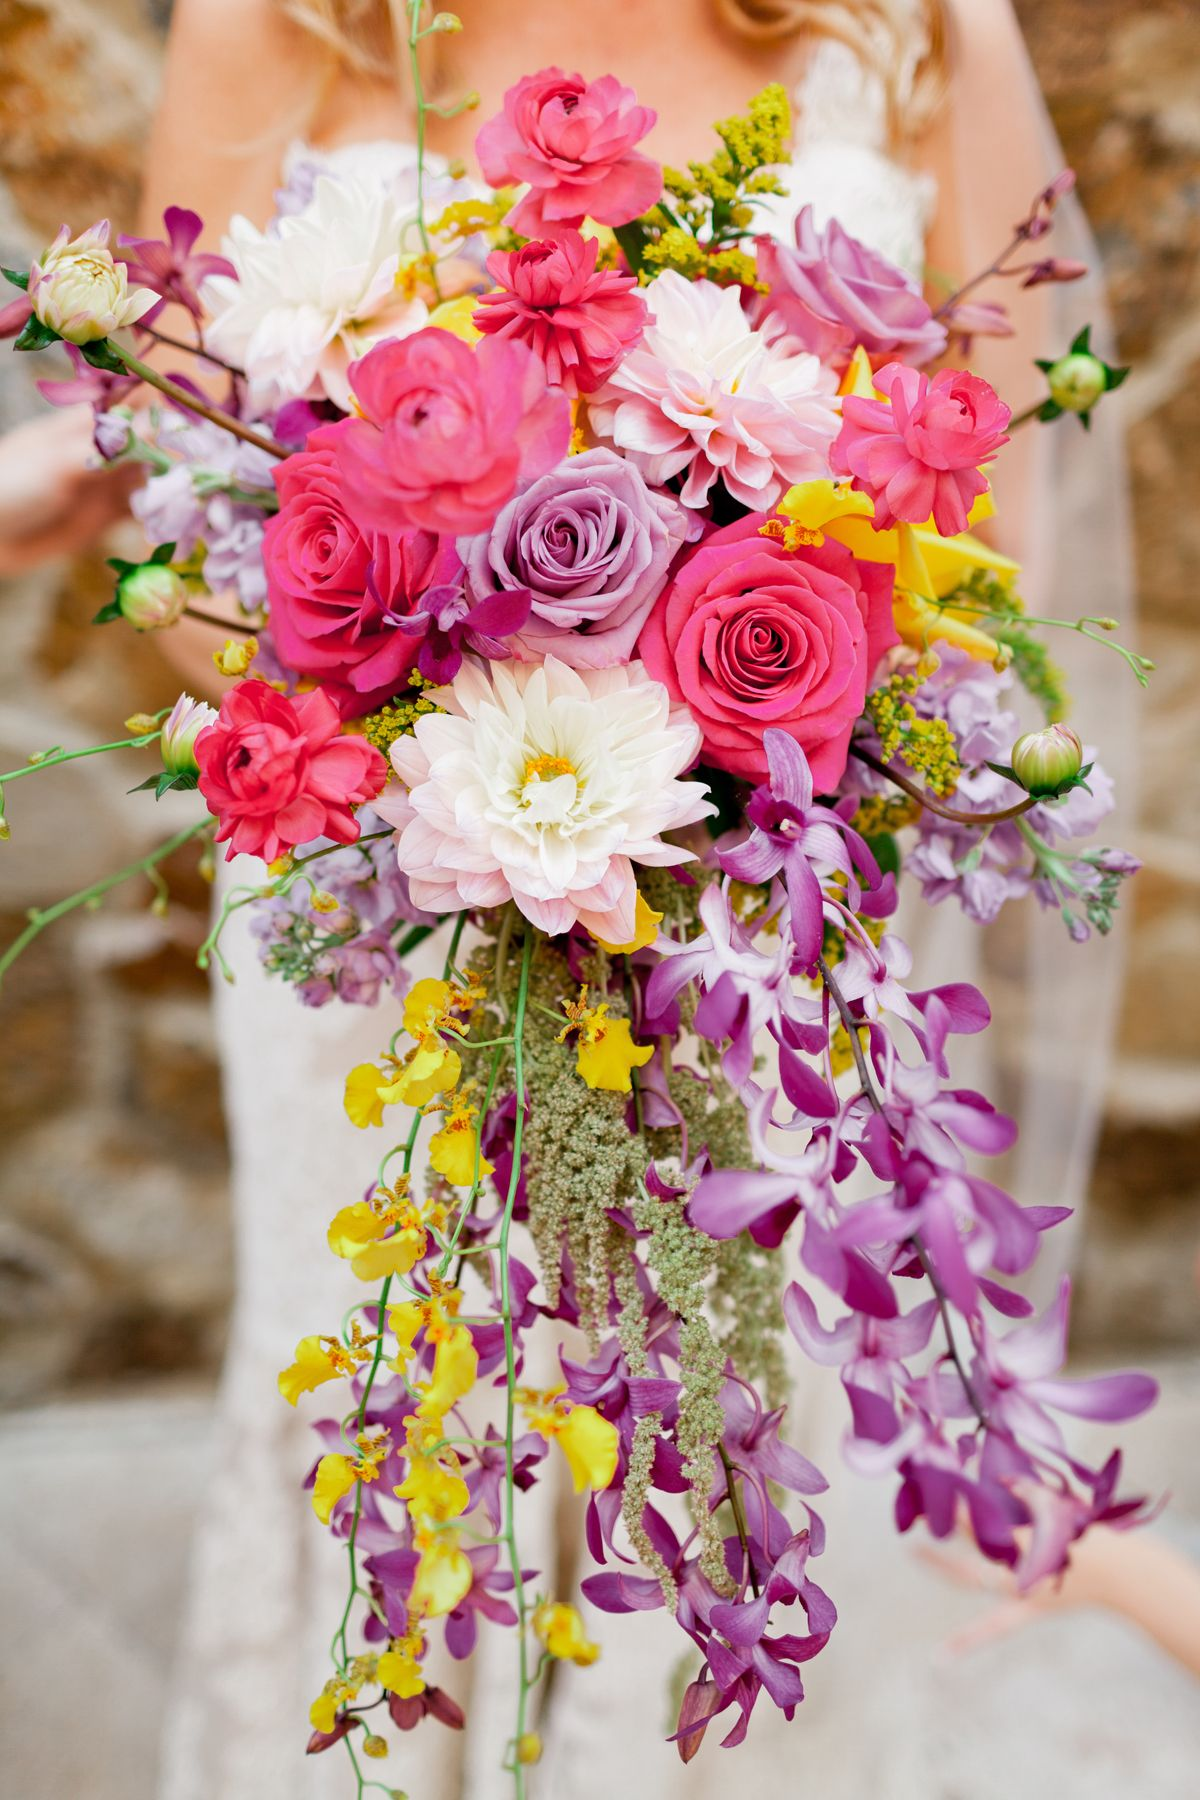 Ipw Reception Corporate Event Photographyorlando Wedding: Lee James Floral Designs